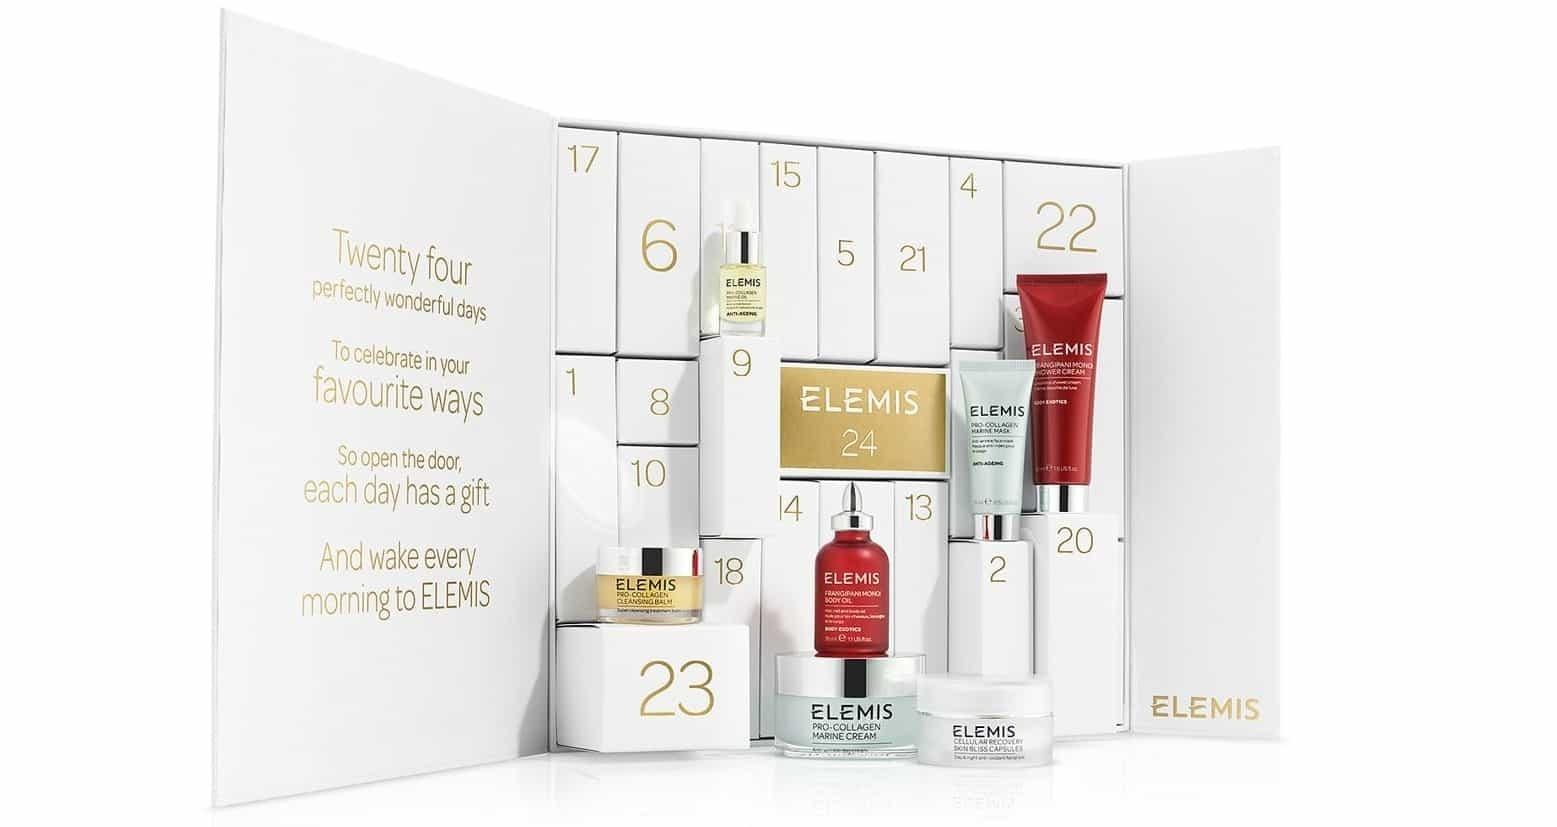 Elemis Advent Calendar 2017 Available Now + Full Spoilers  Elemis Advent Calendar